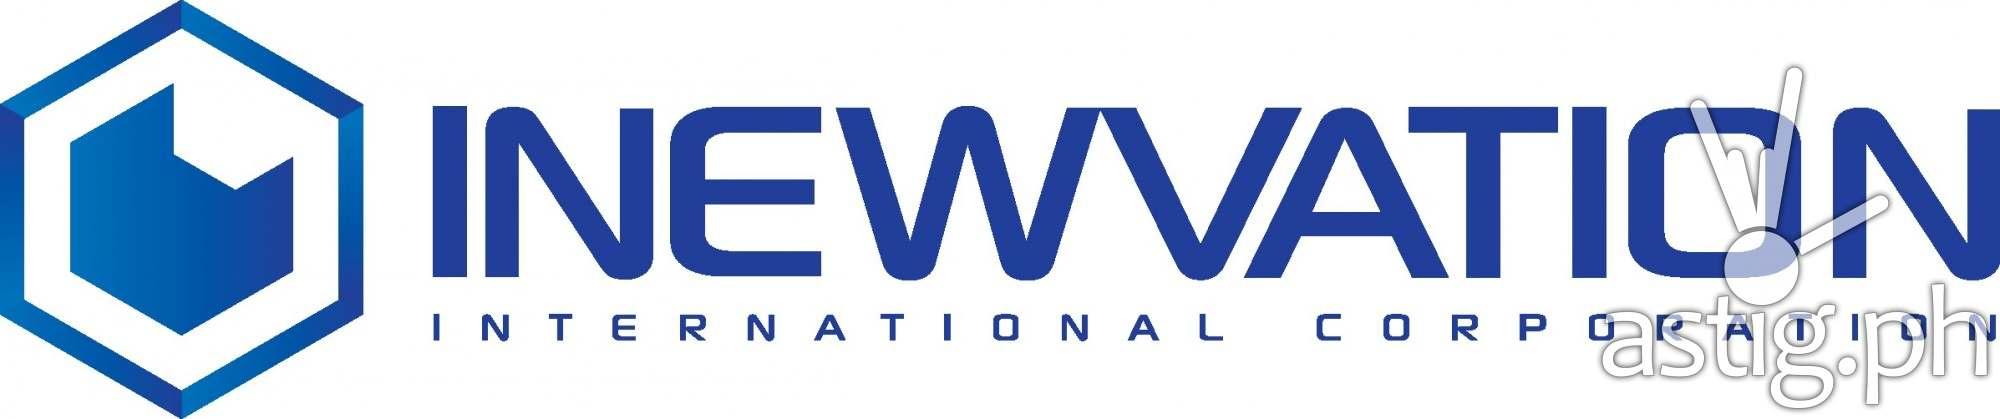 Inewvation International Corp Logo (3D)-01